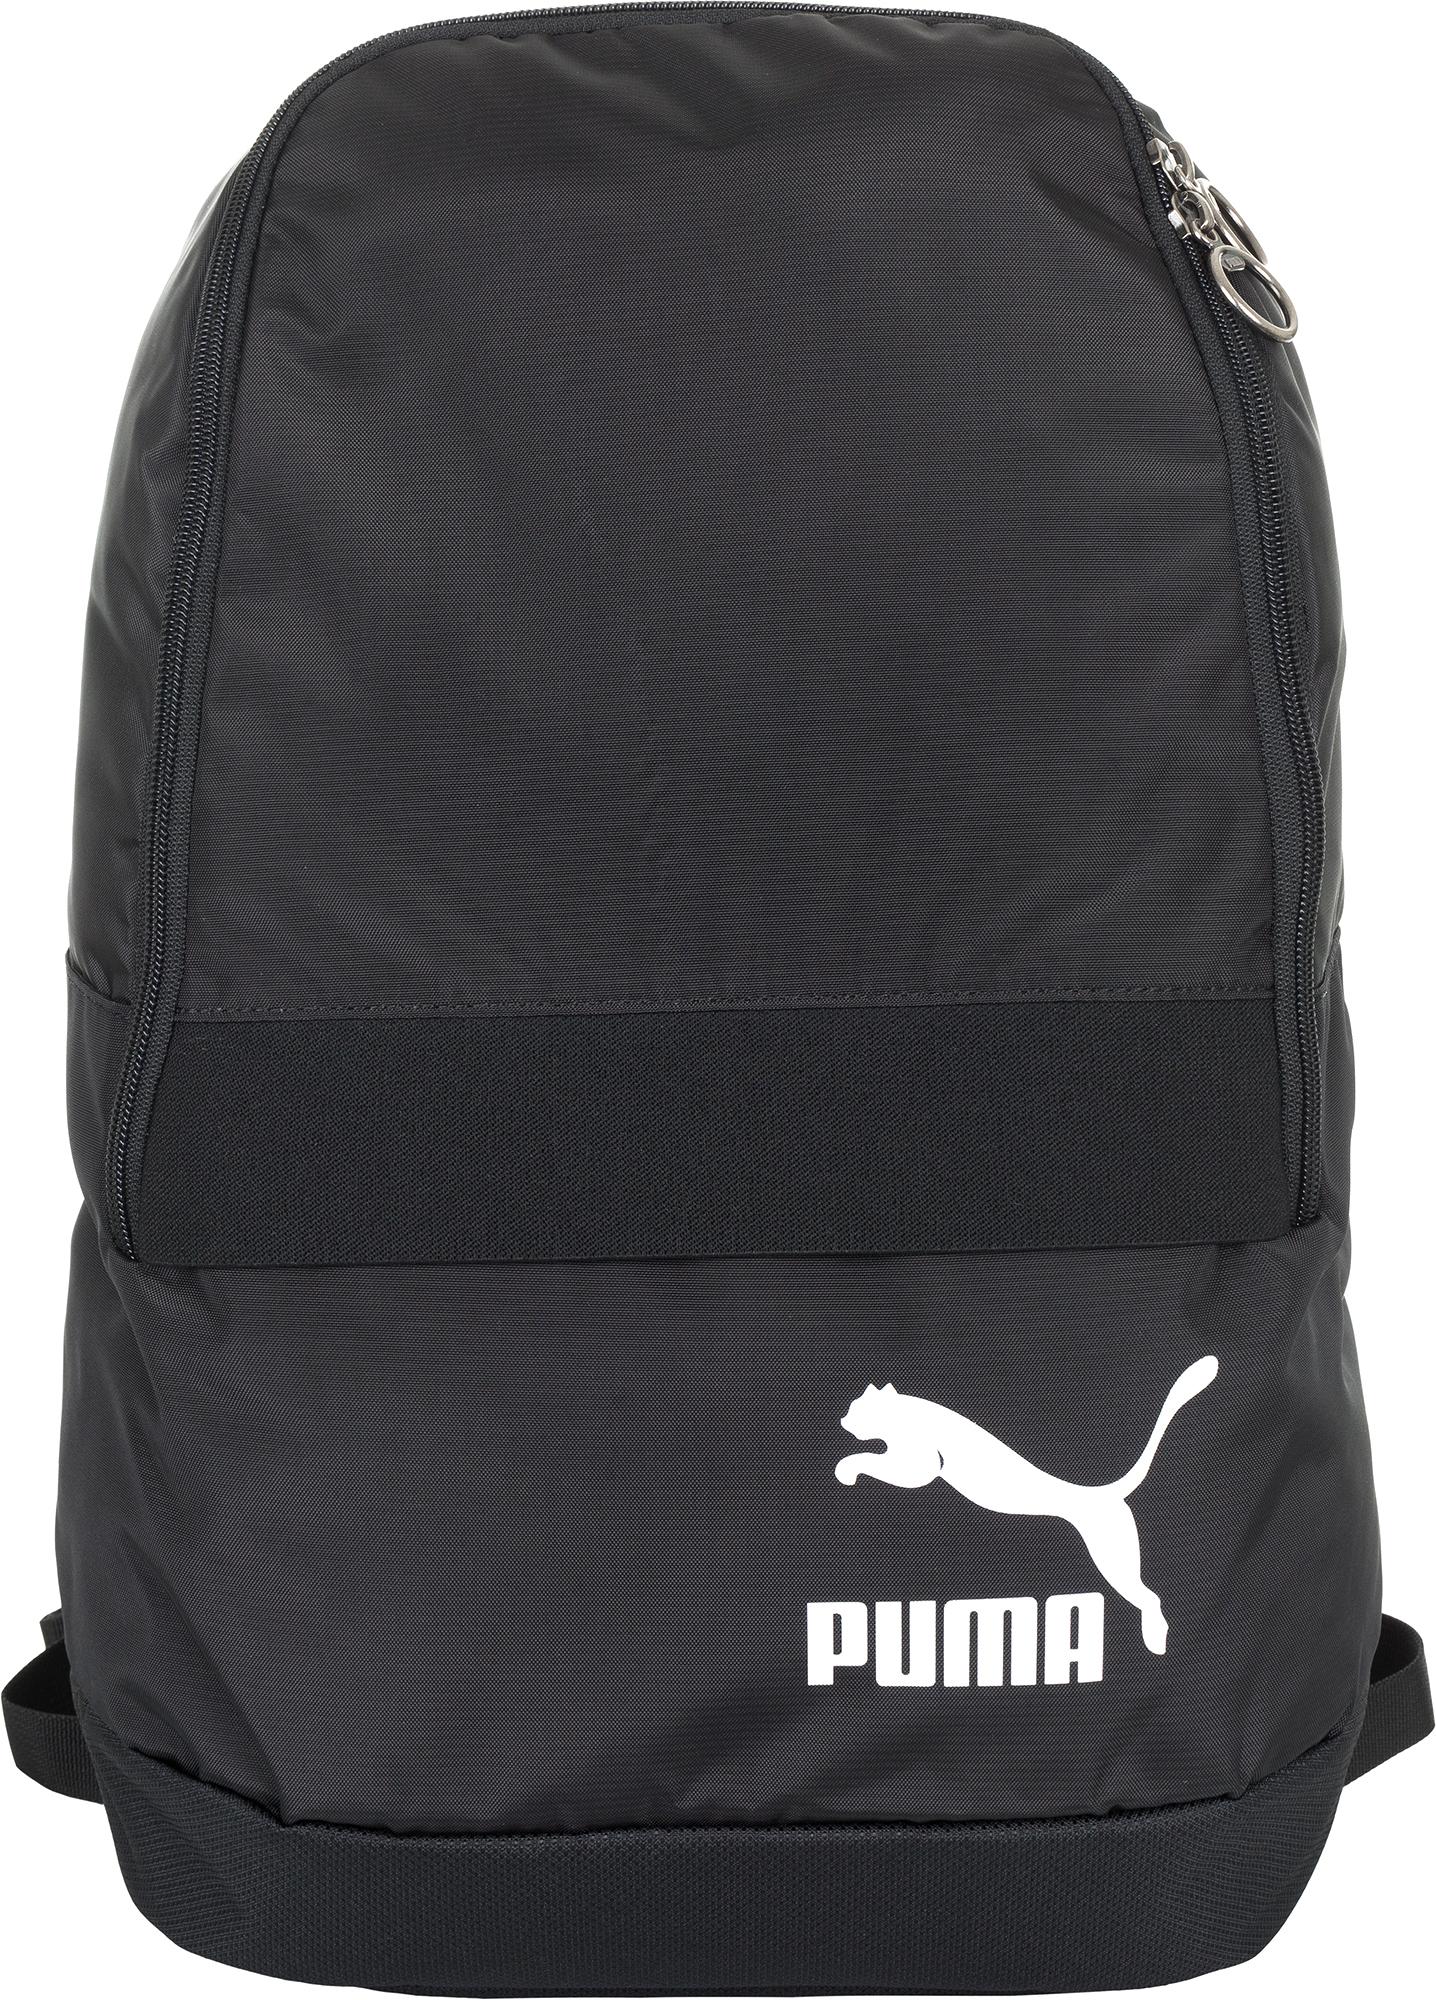 Puma Рюкзак Puma Originals Tren, размер Без размера цена